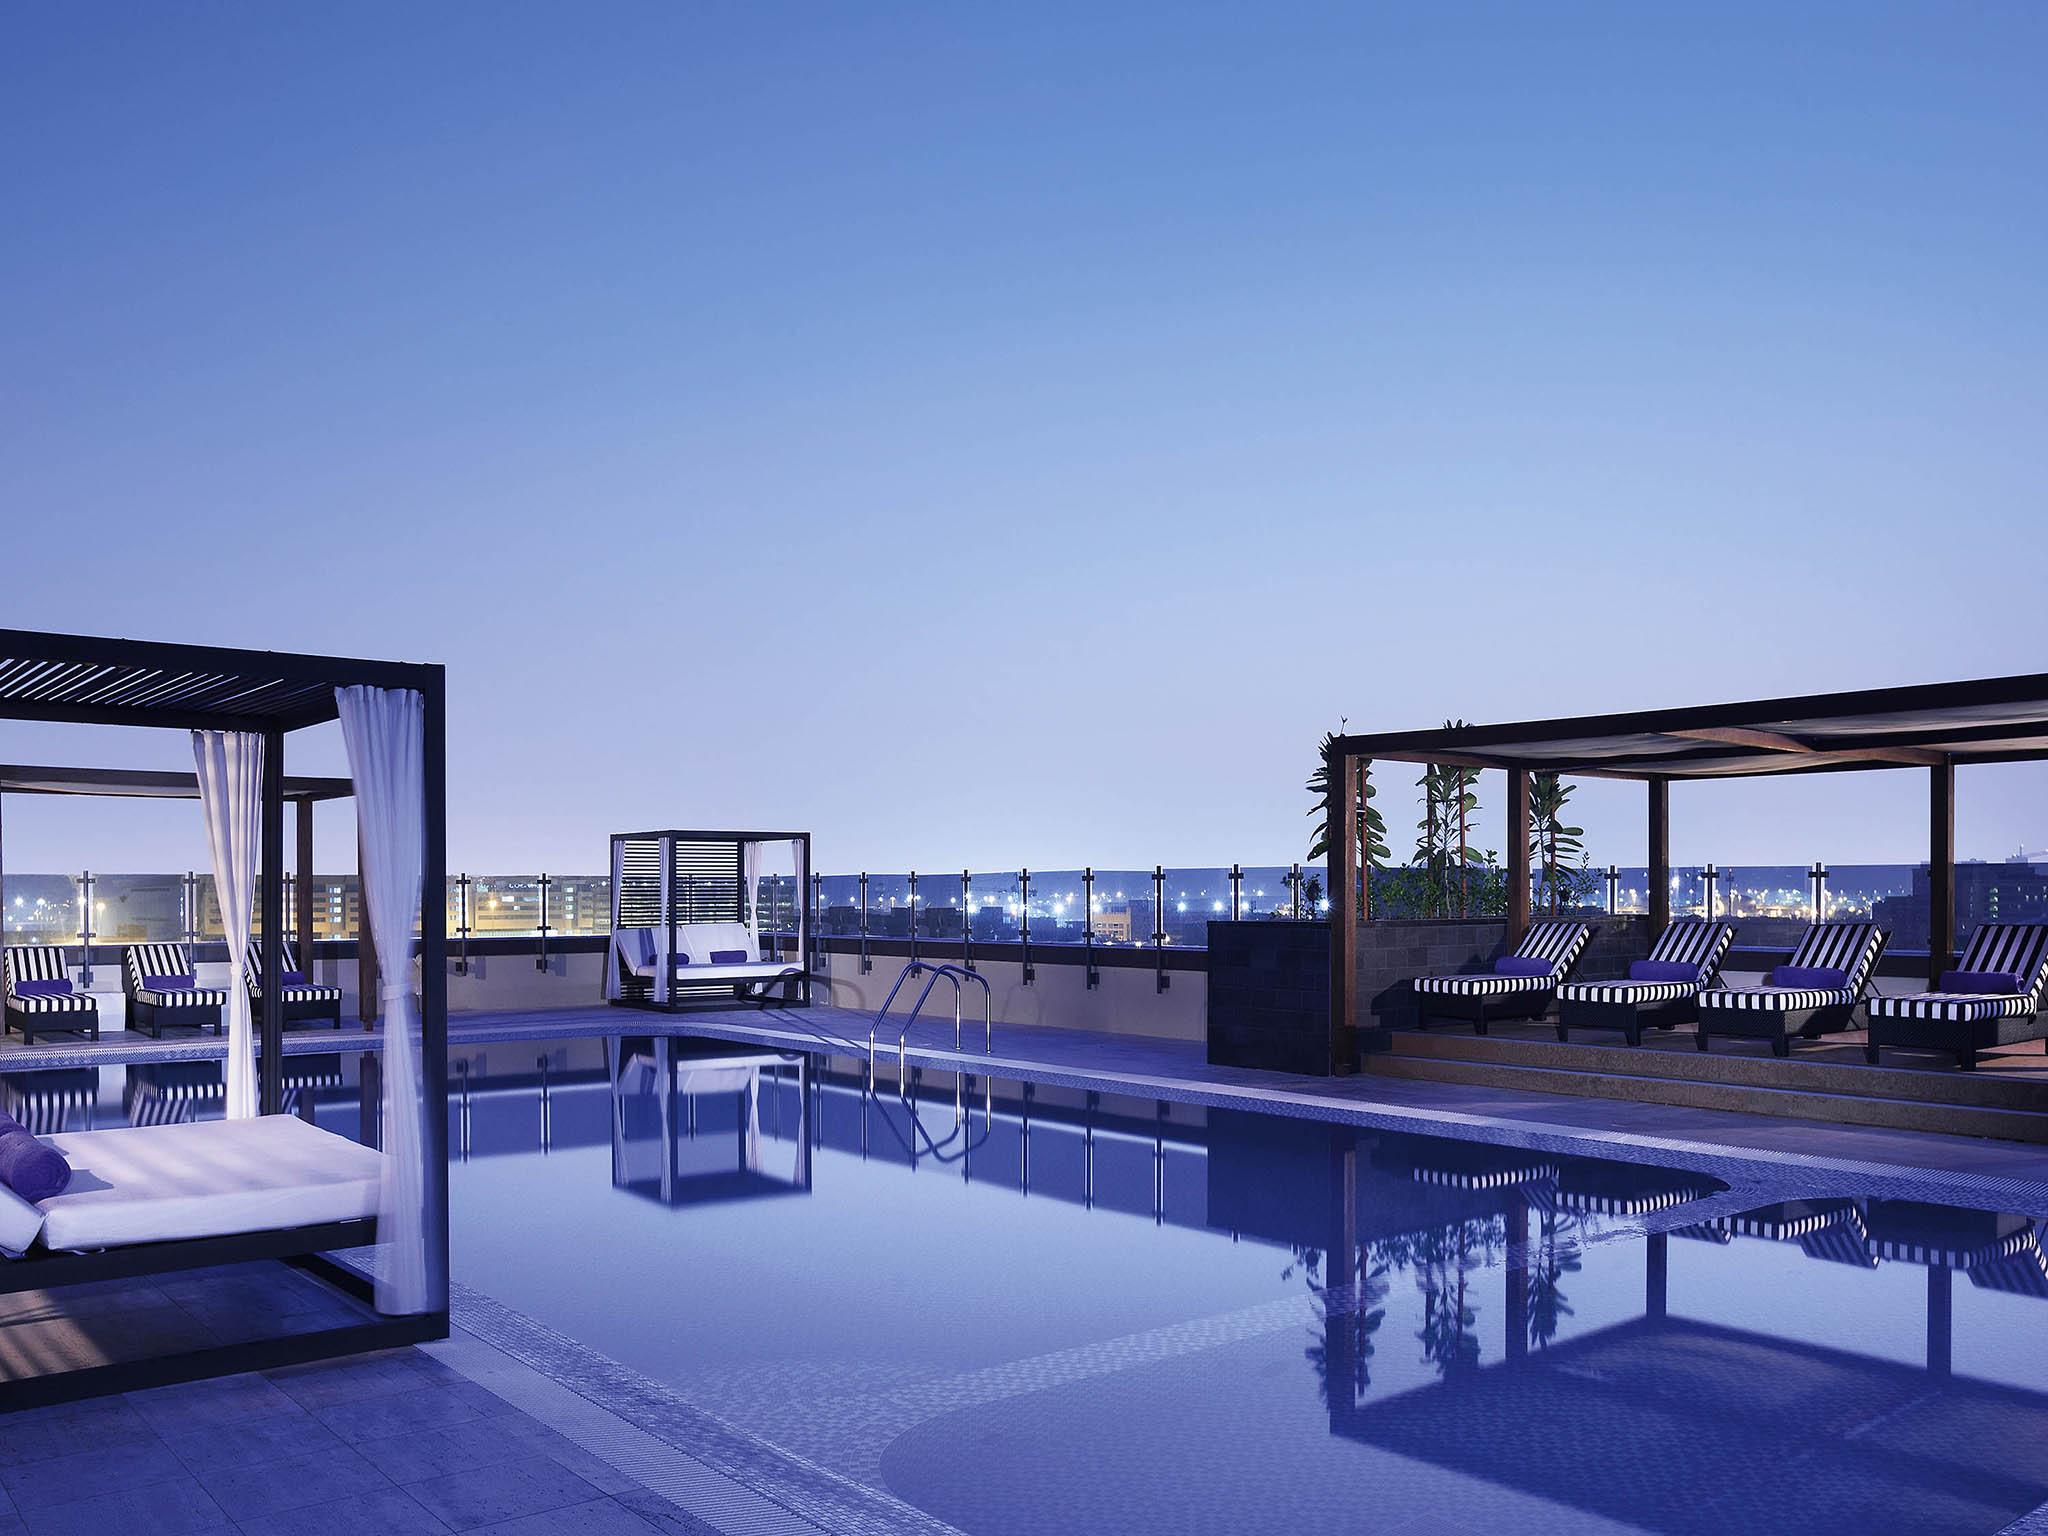 five star hotels sharjah